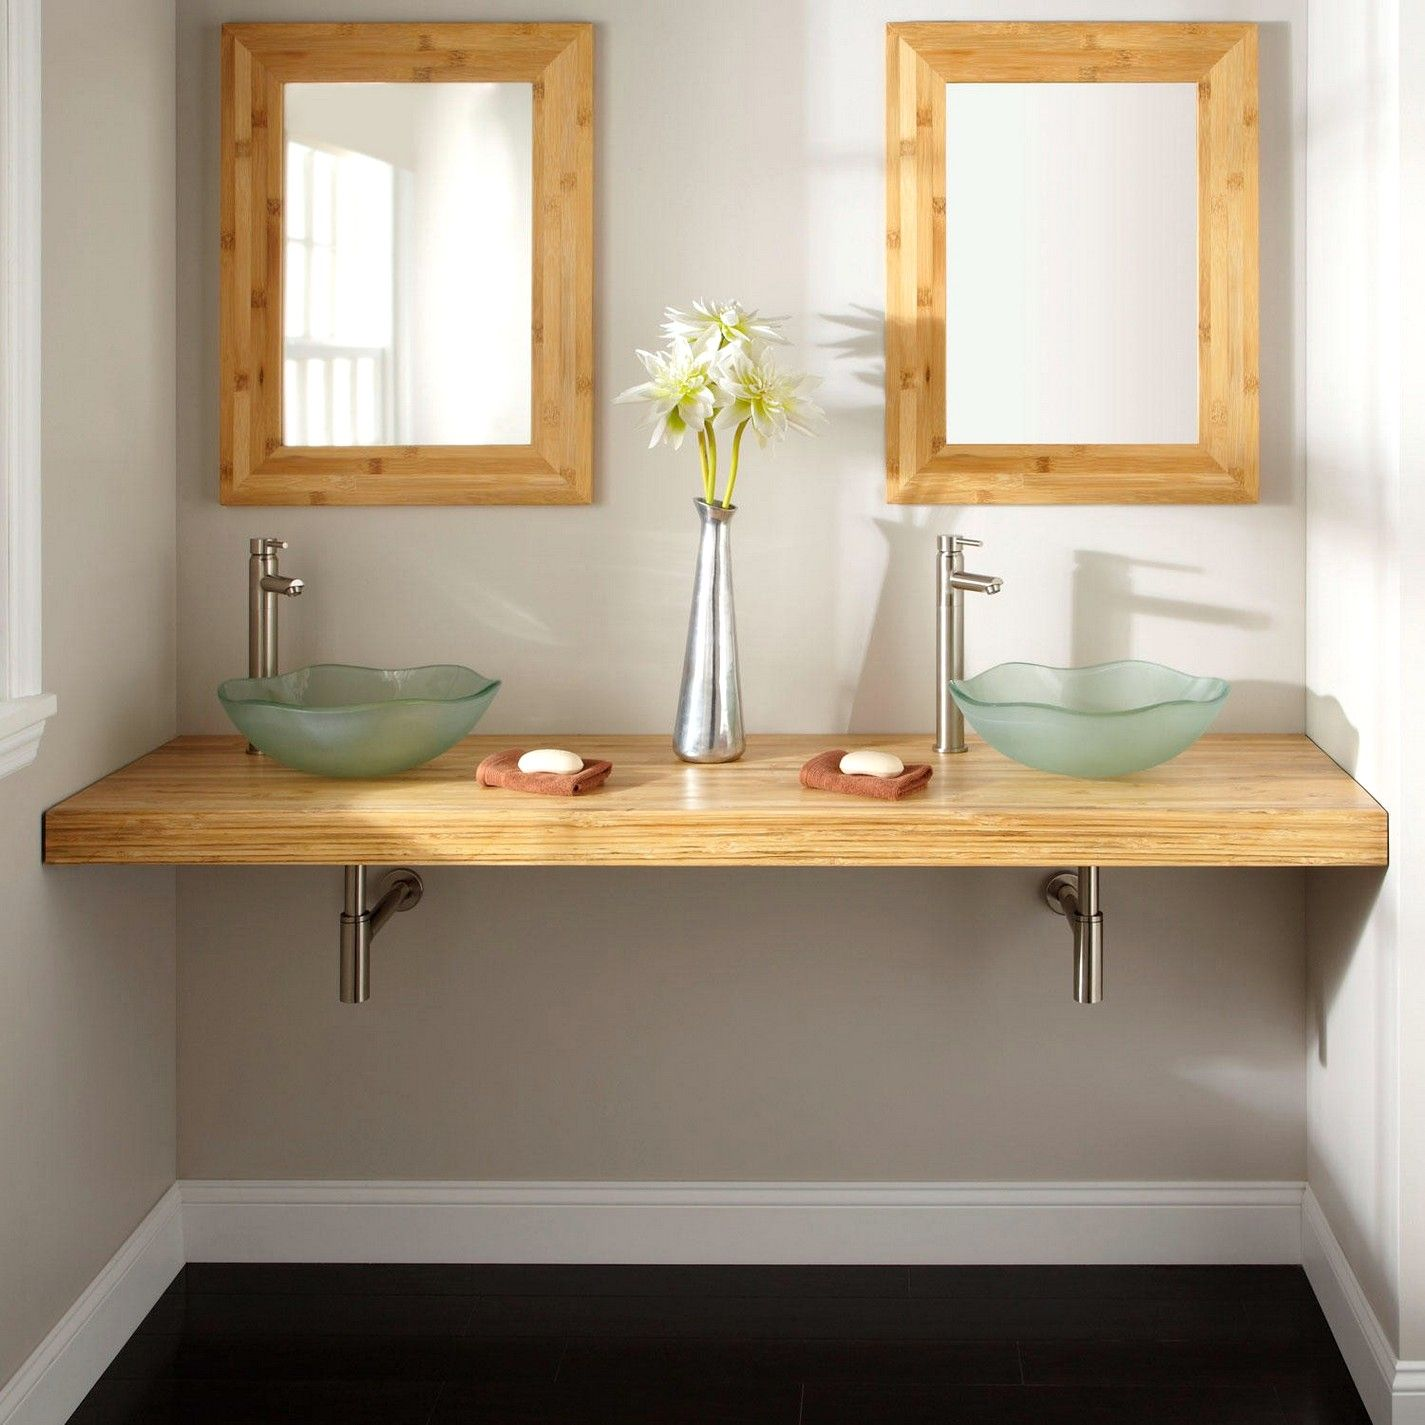 bamboo bathroom vanity : Bamboo Bathroom Cabinet HomeWallpaperinfo ...